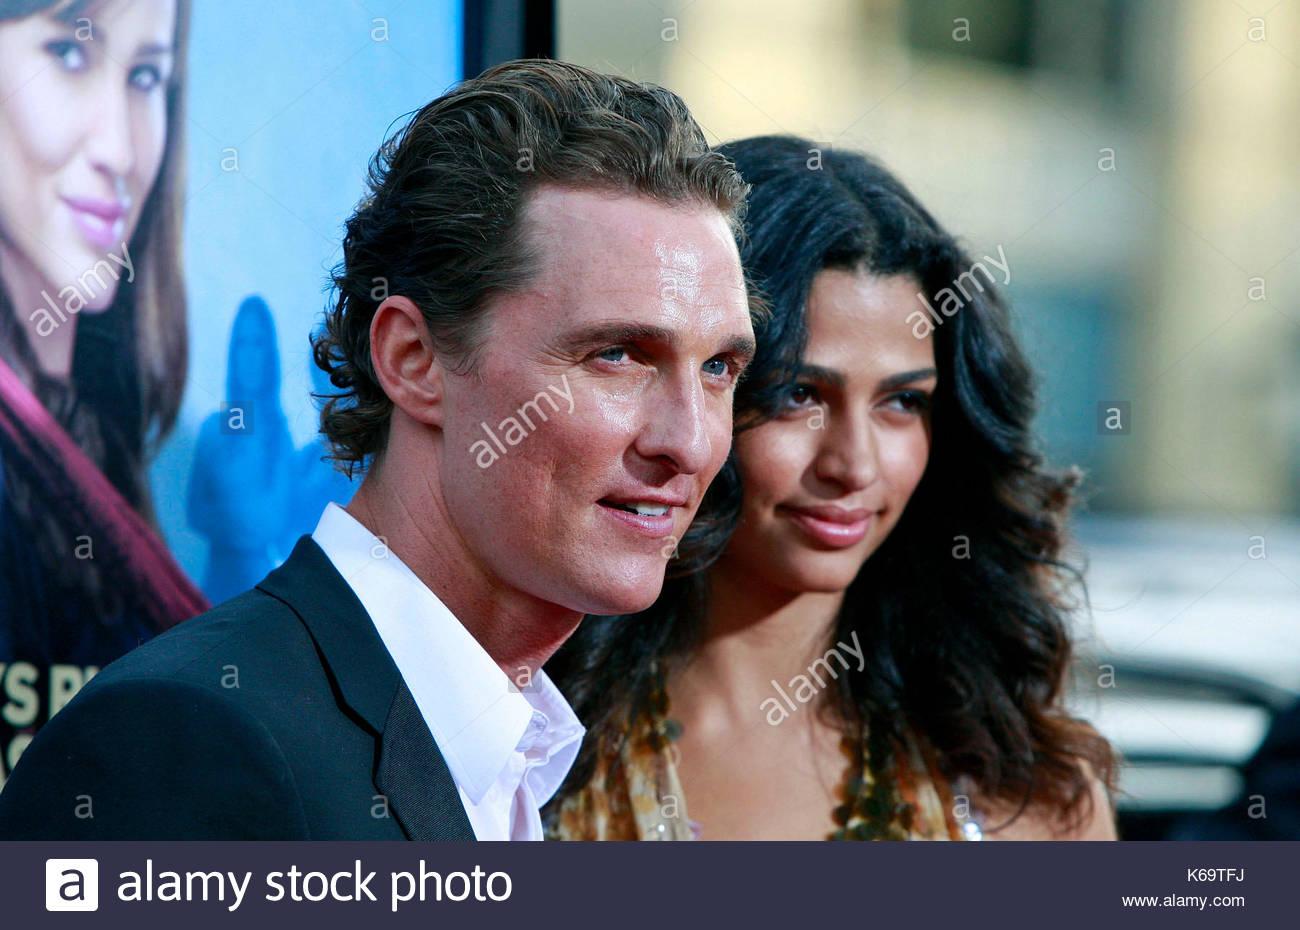 Matthew McConaughey And Camila Alves Actress Jennifer Garner Looks Stock Photo 158798070